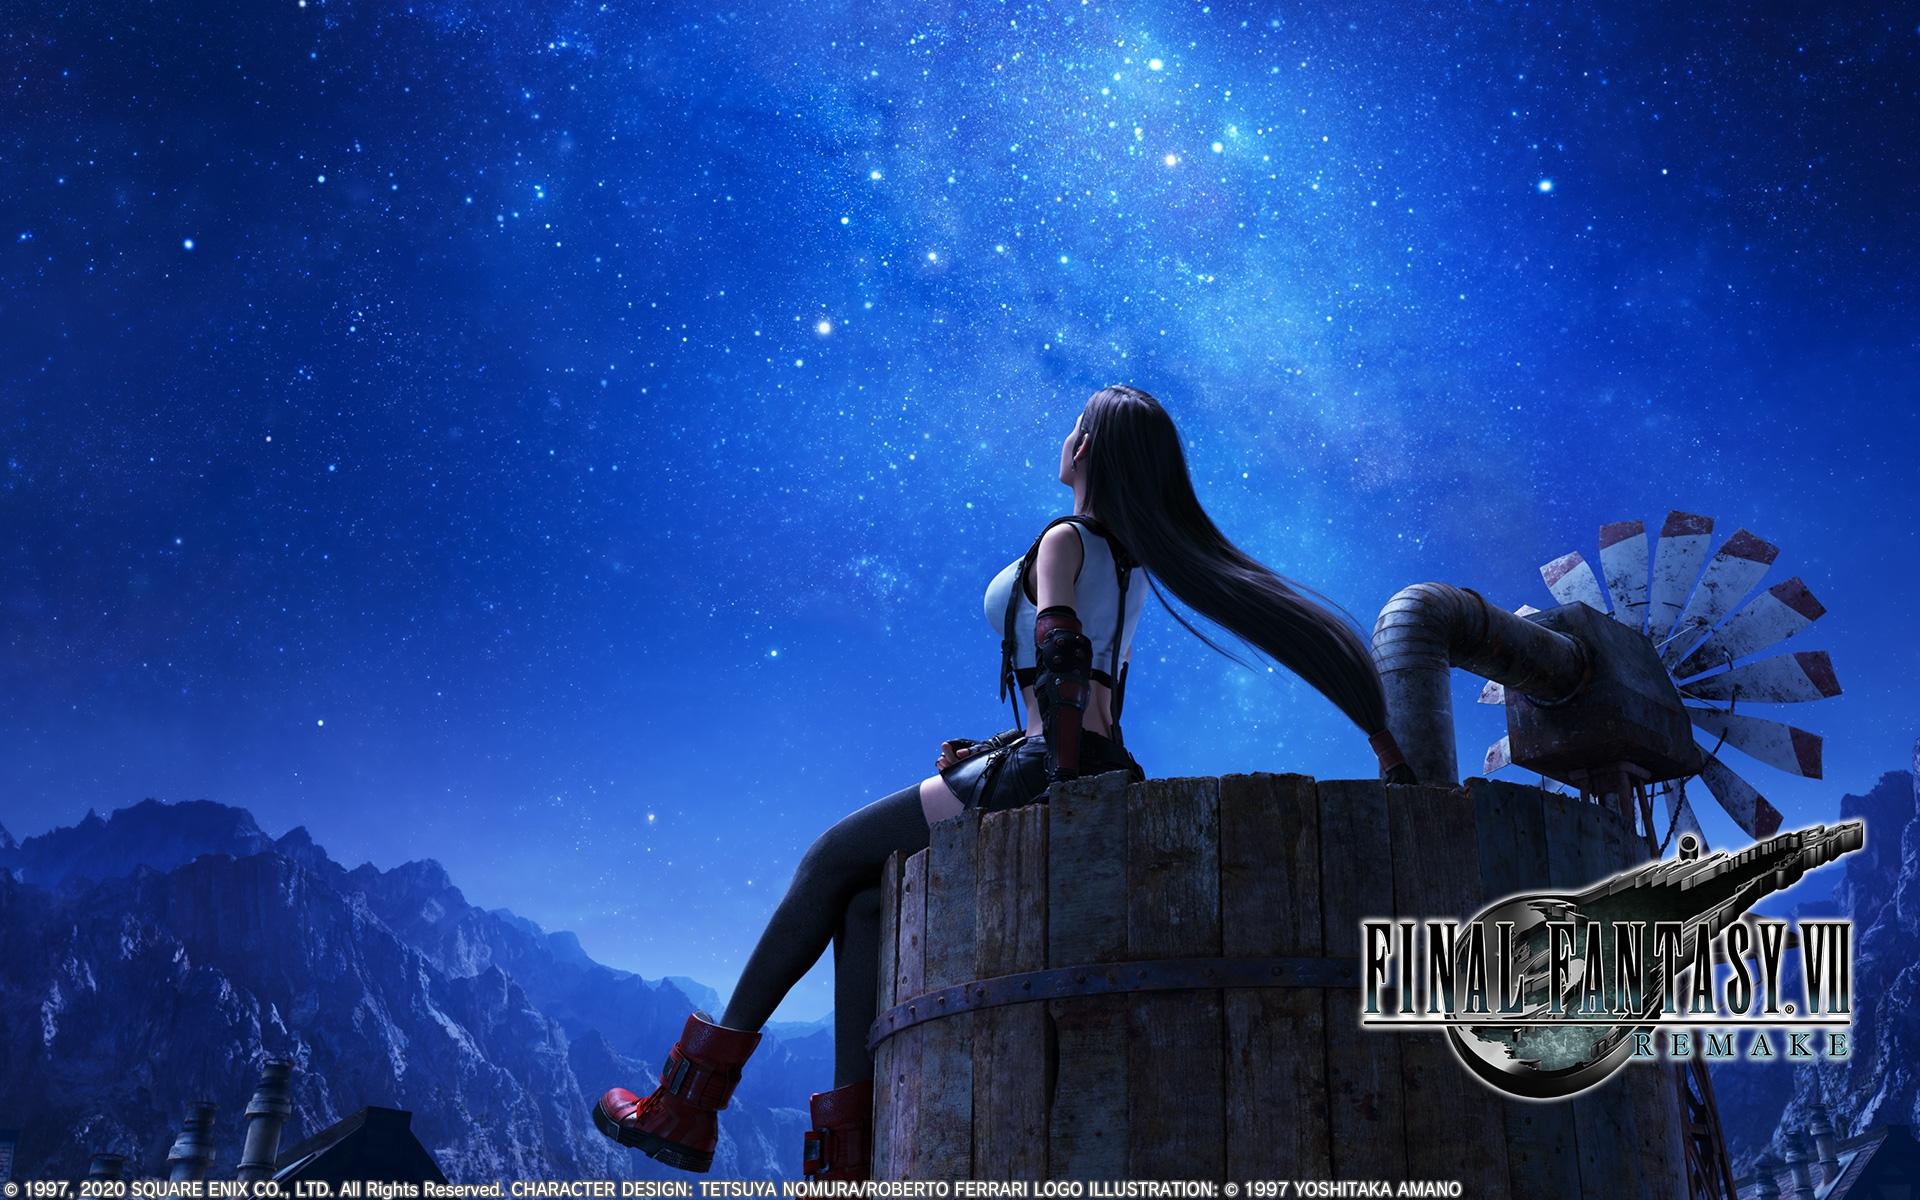 Wallpaper Final Fantasy Vii Remake Final Fantasy Vii Tifa Lockhart 1920x1200 Aic9182 1840299 Hd Wallpapers Wallhere